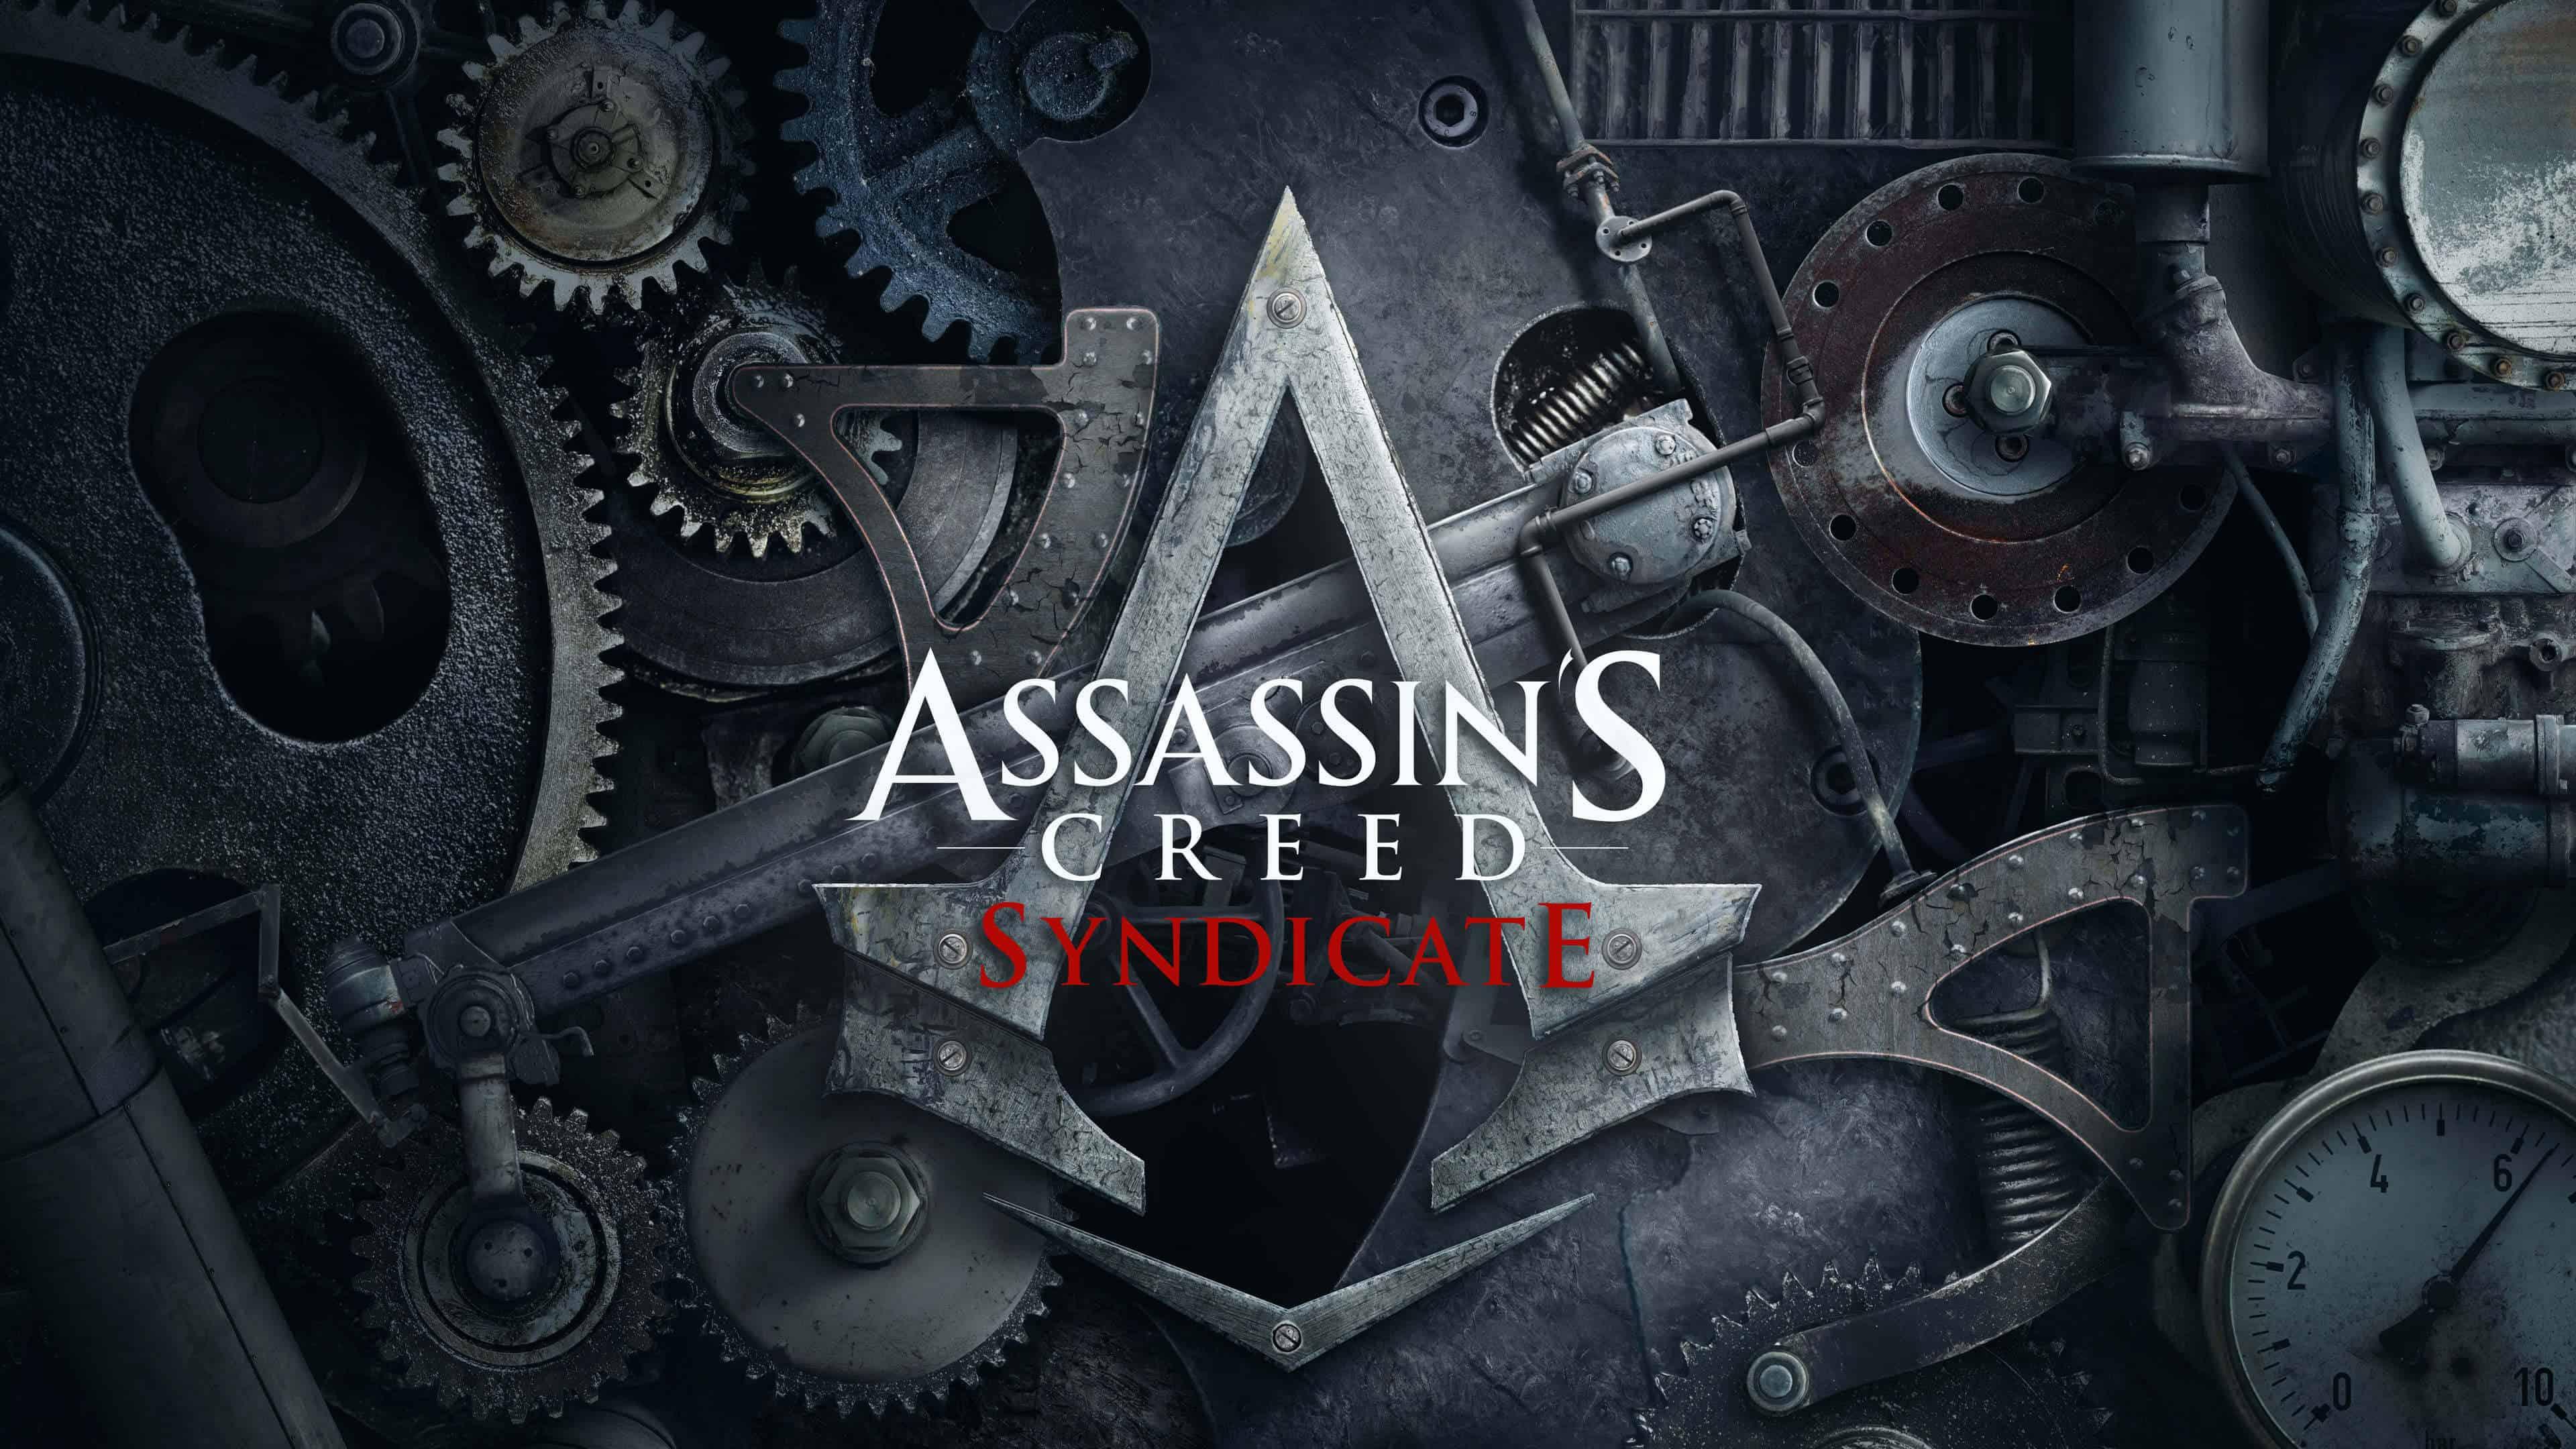 assassins creed syndicate logo uhd 4k wallpaper